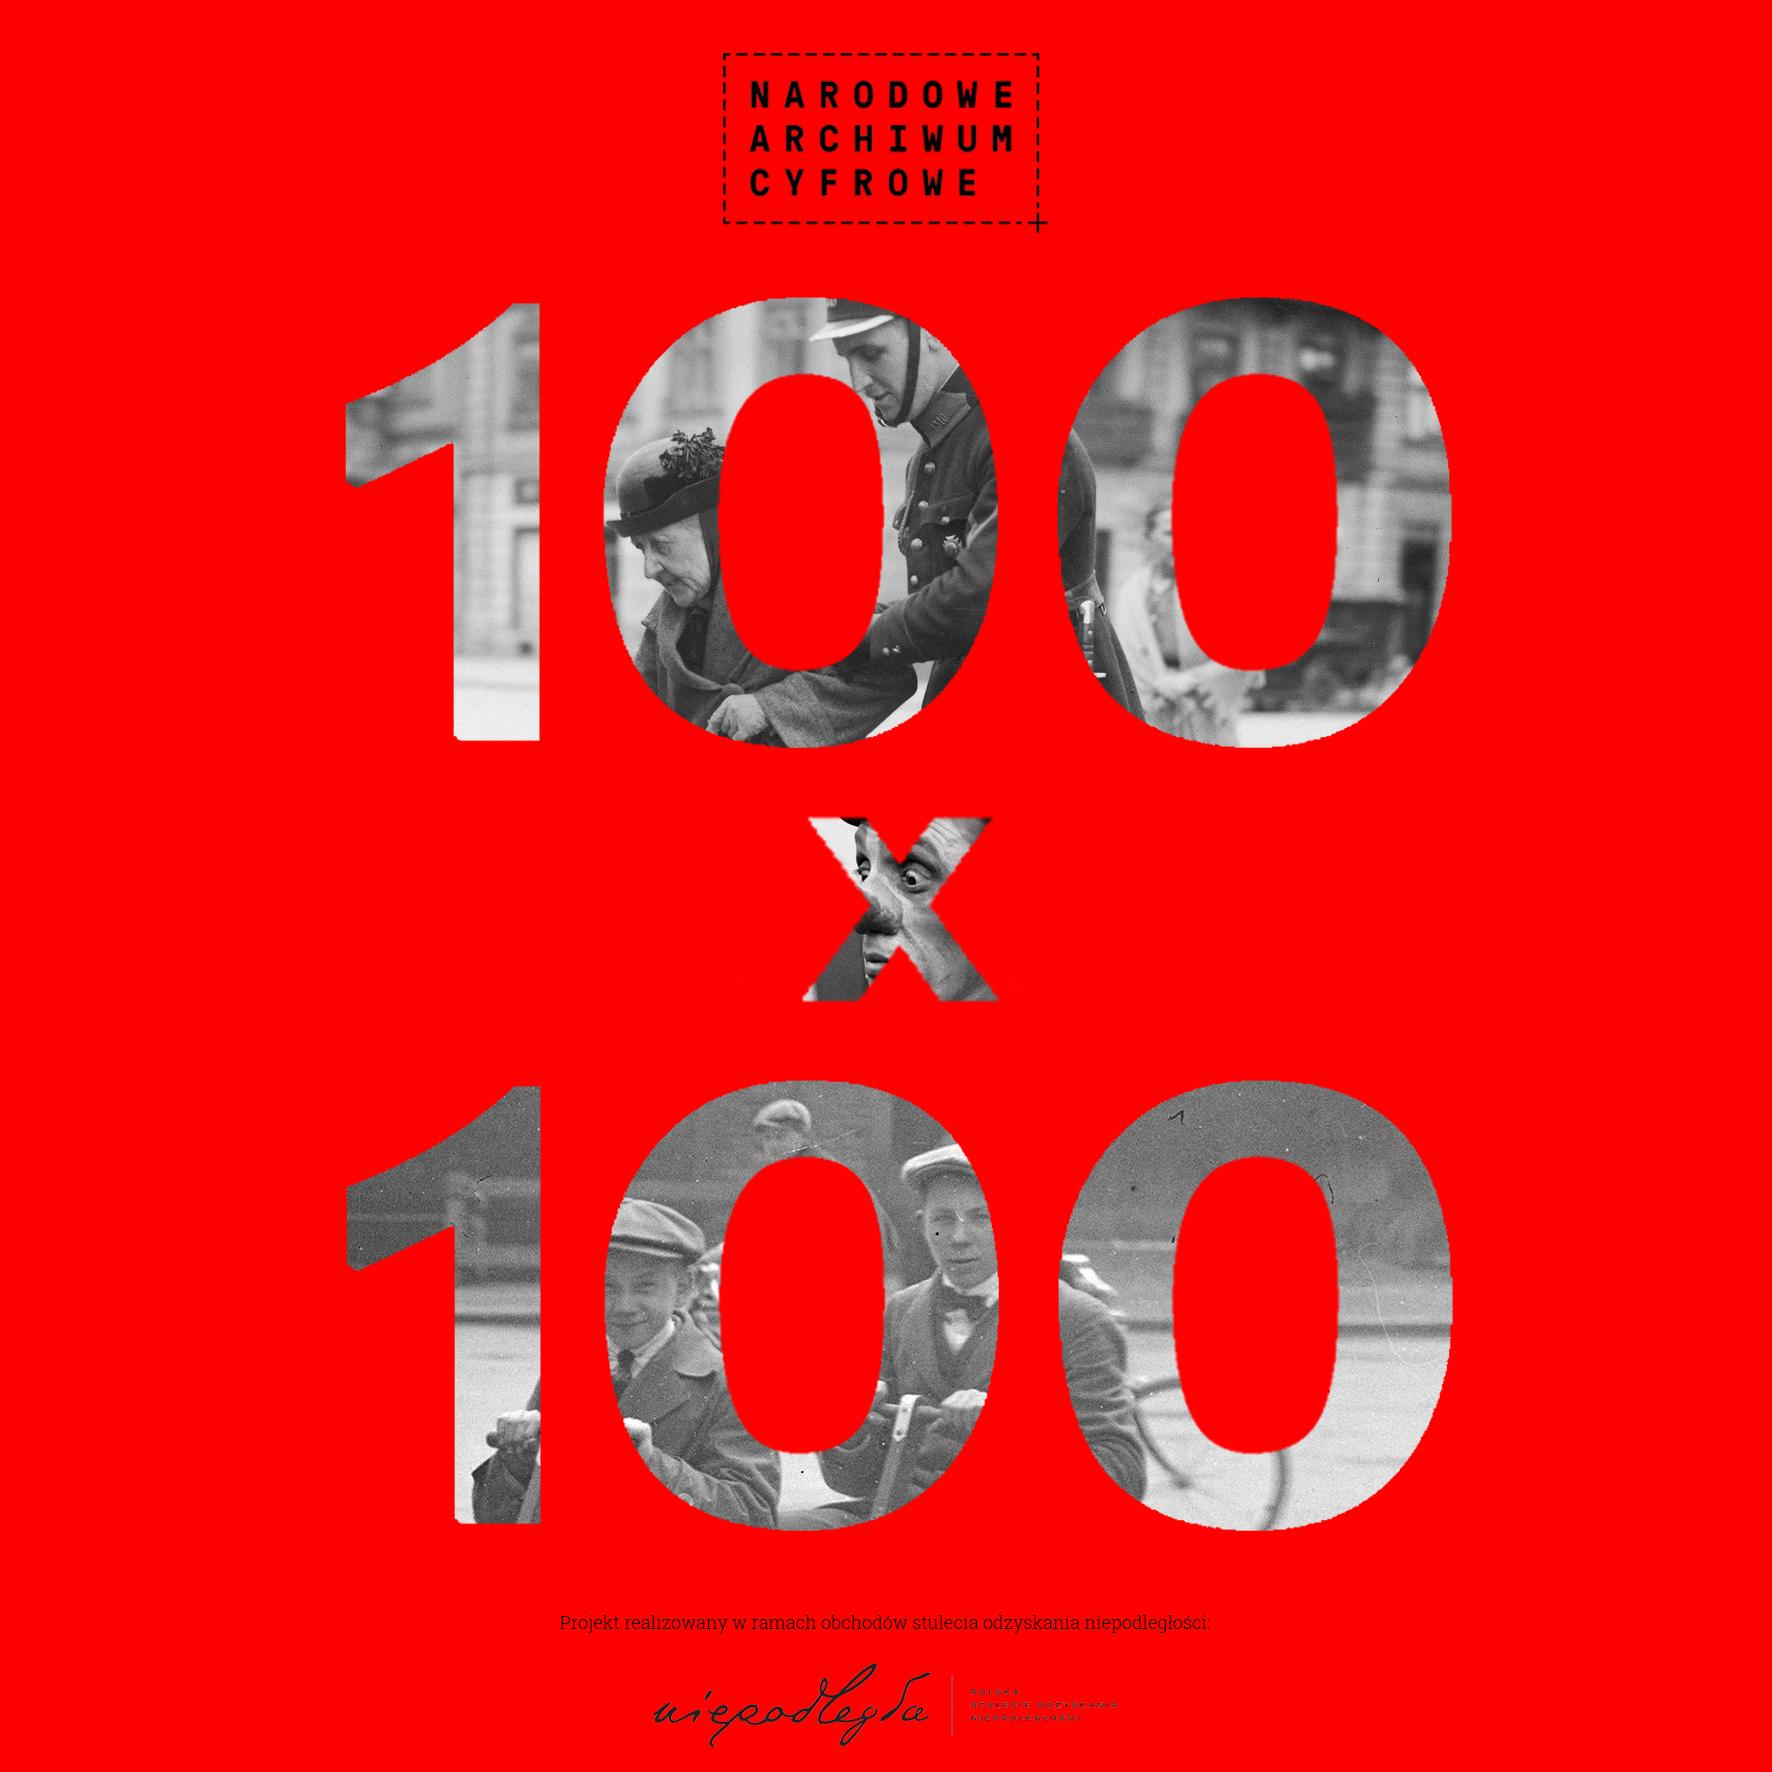 100 100 wybierz z nami 100 zdj na 100 lecie niepodleg o ci nac. Black Bedroom Furniture Sets. Home Design Ideas